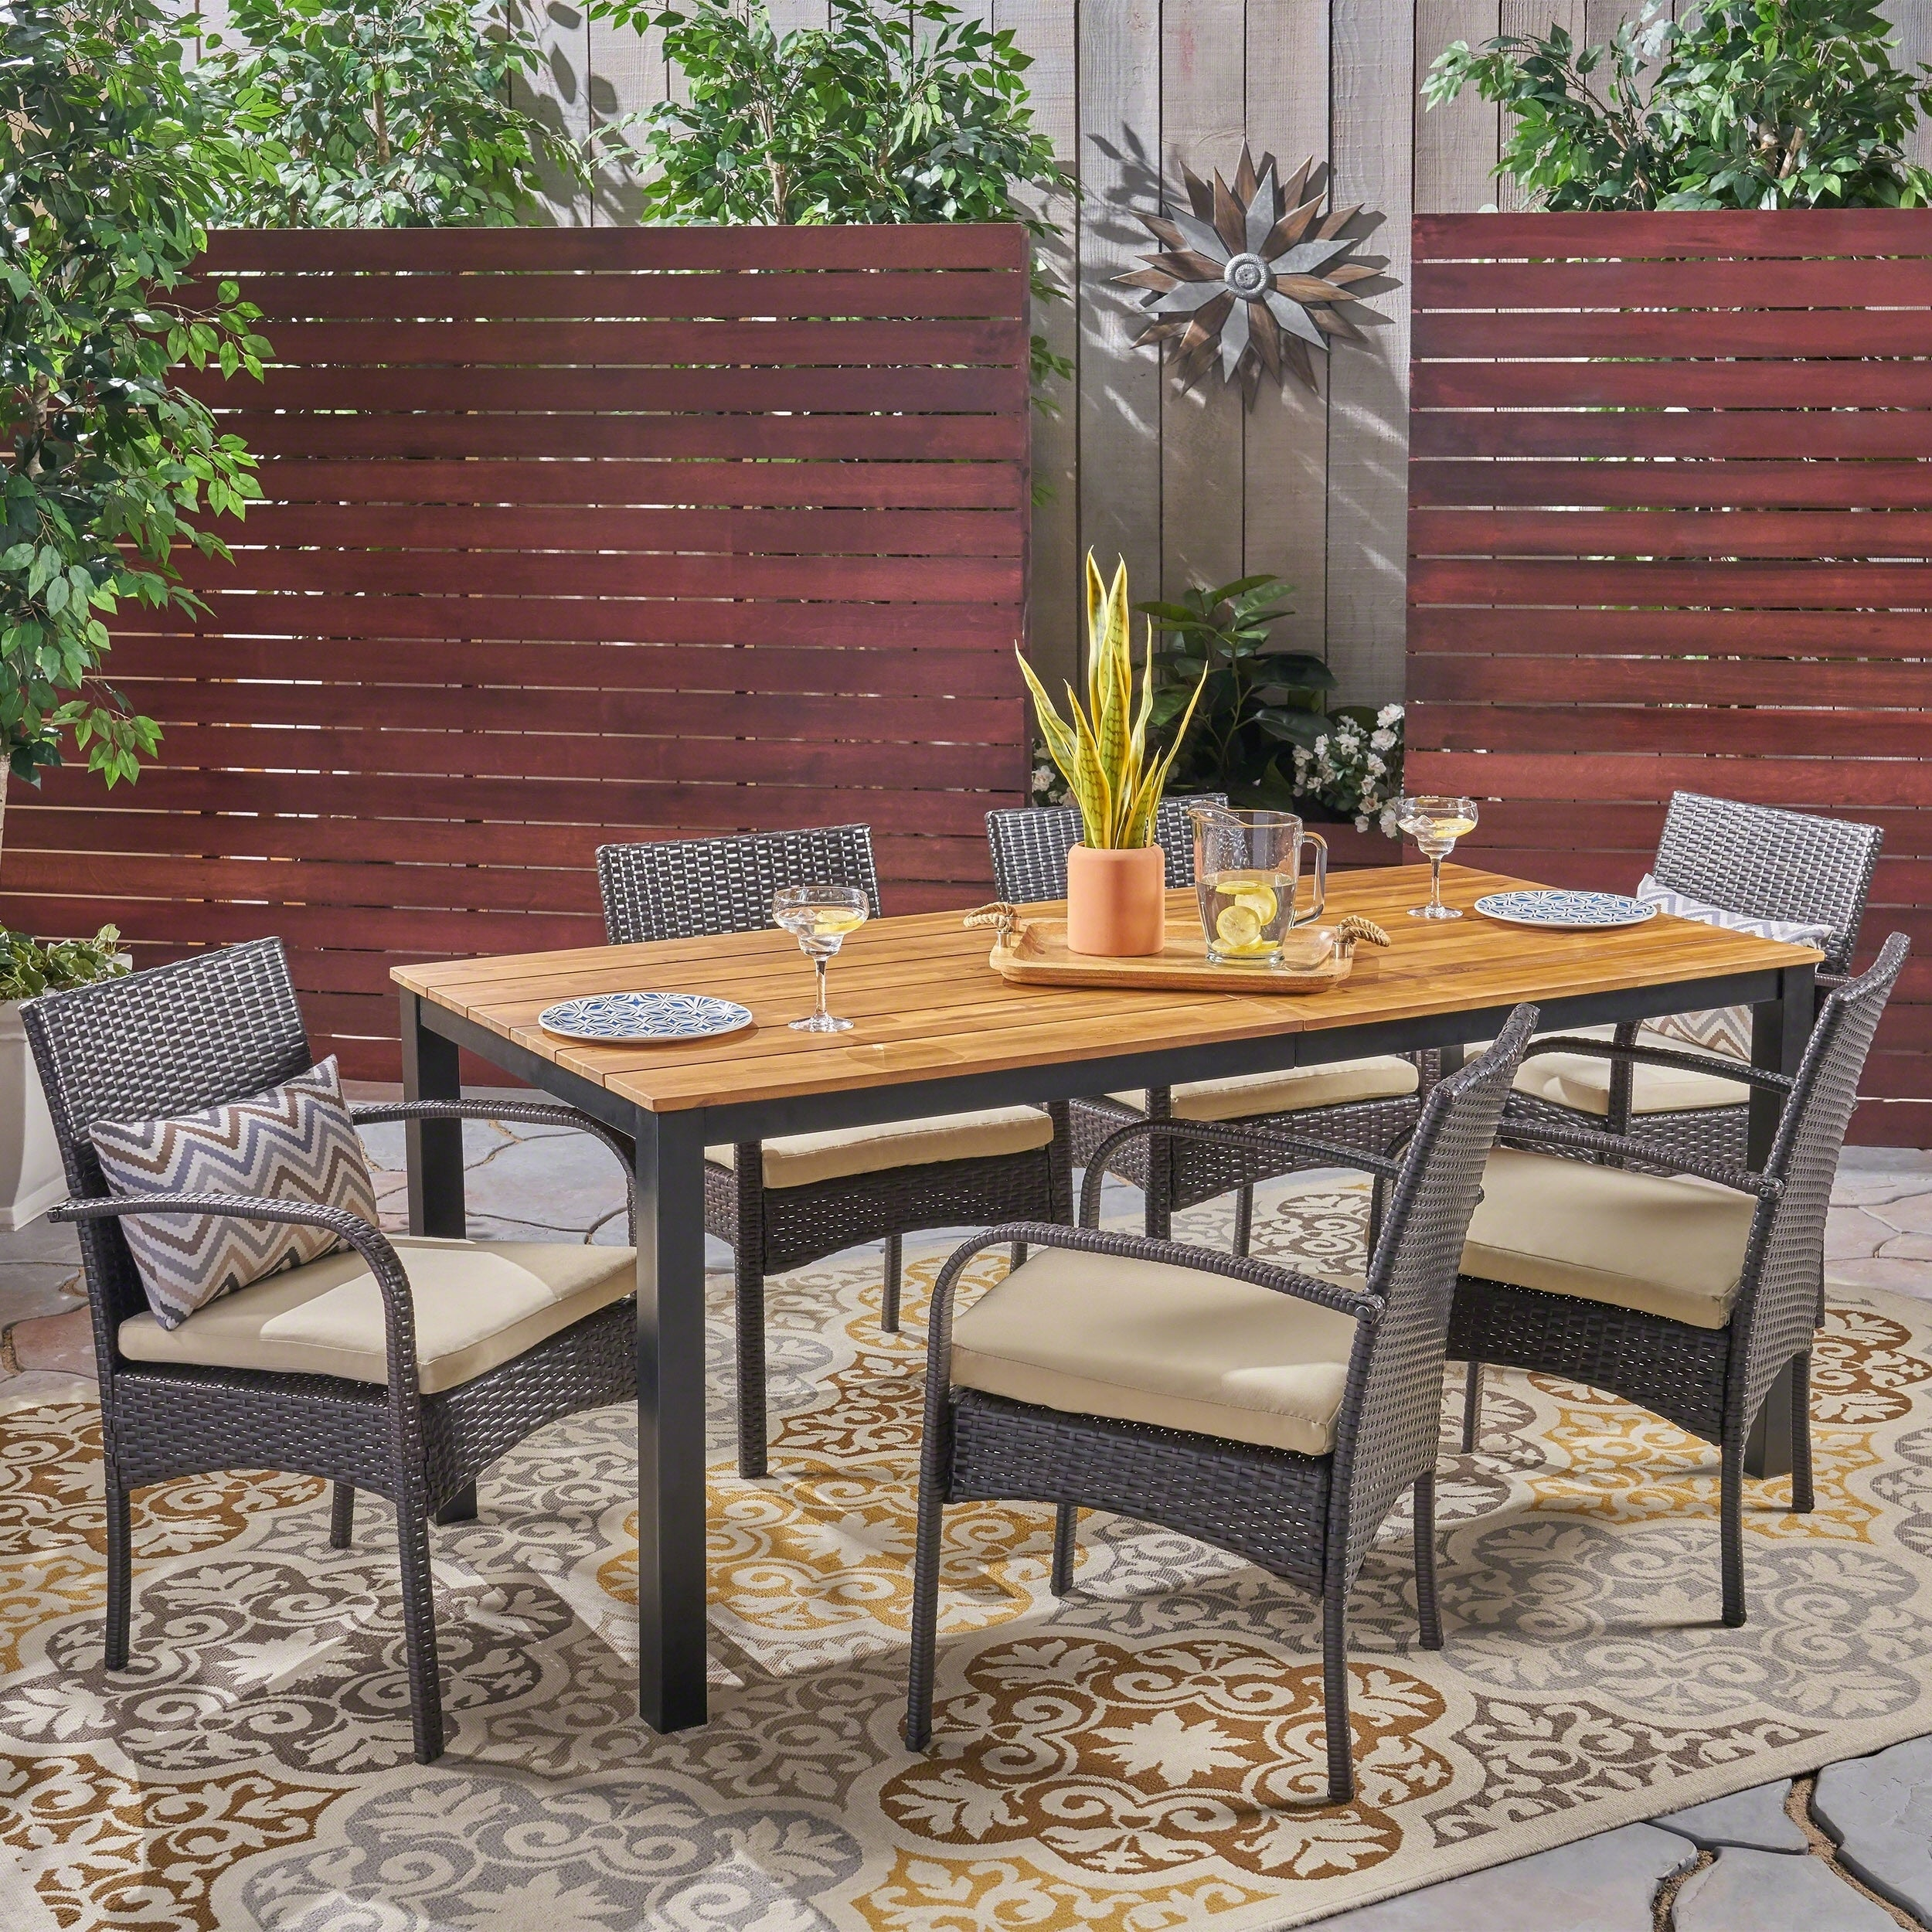 shop ballard outdoor 7 piece acacia wood dining set with wicker